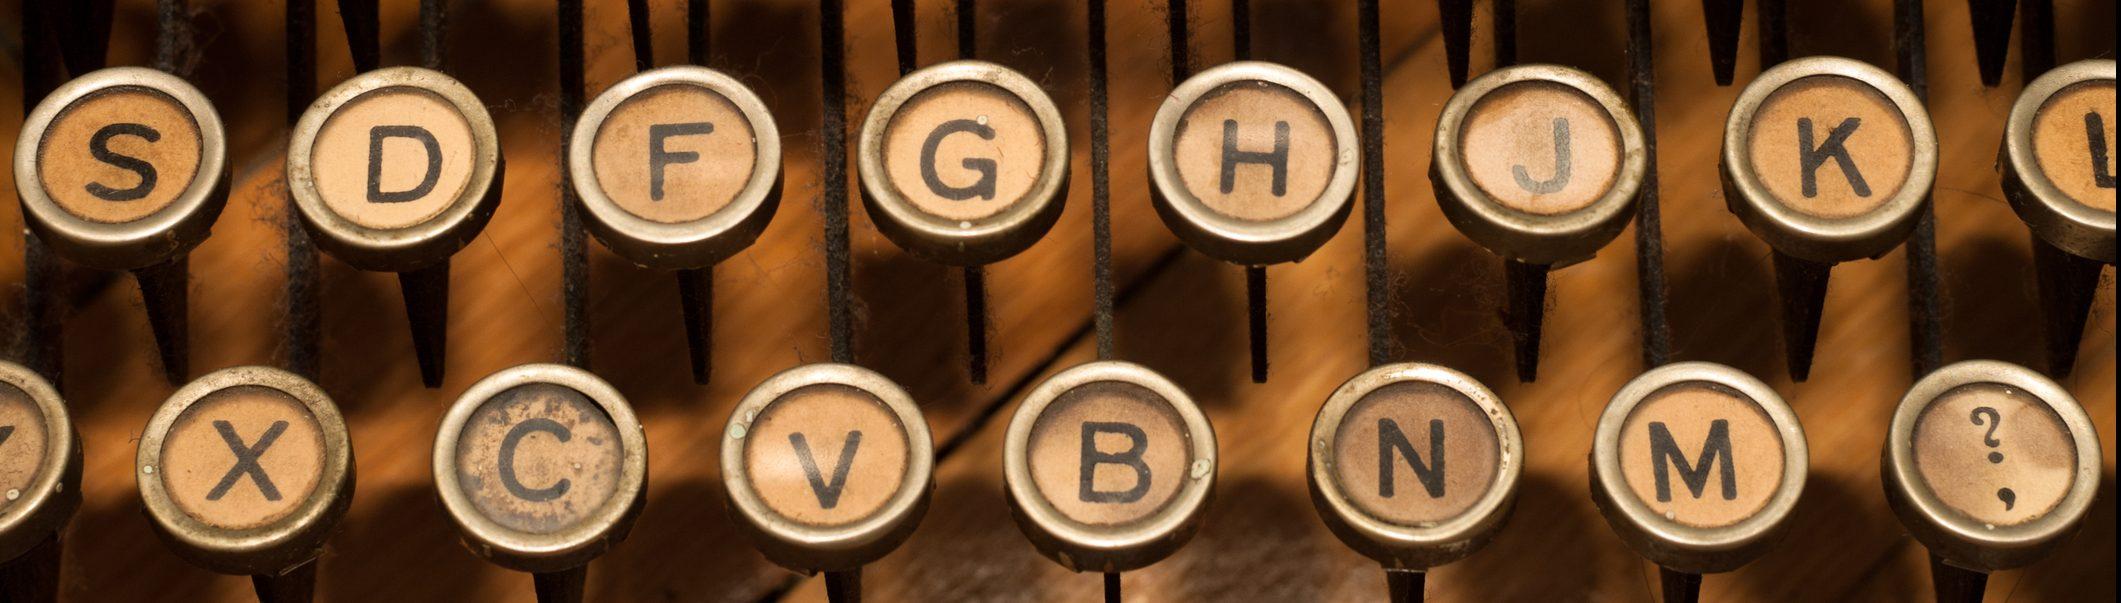 improve your typing skills training